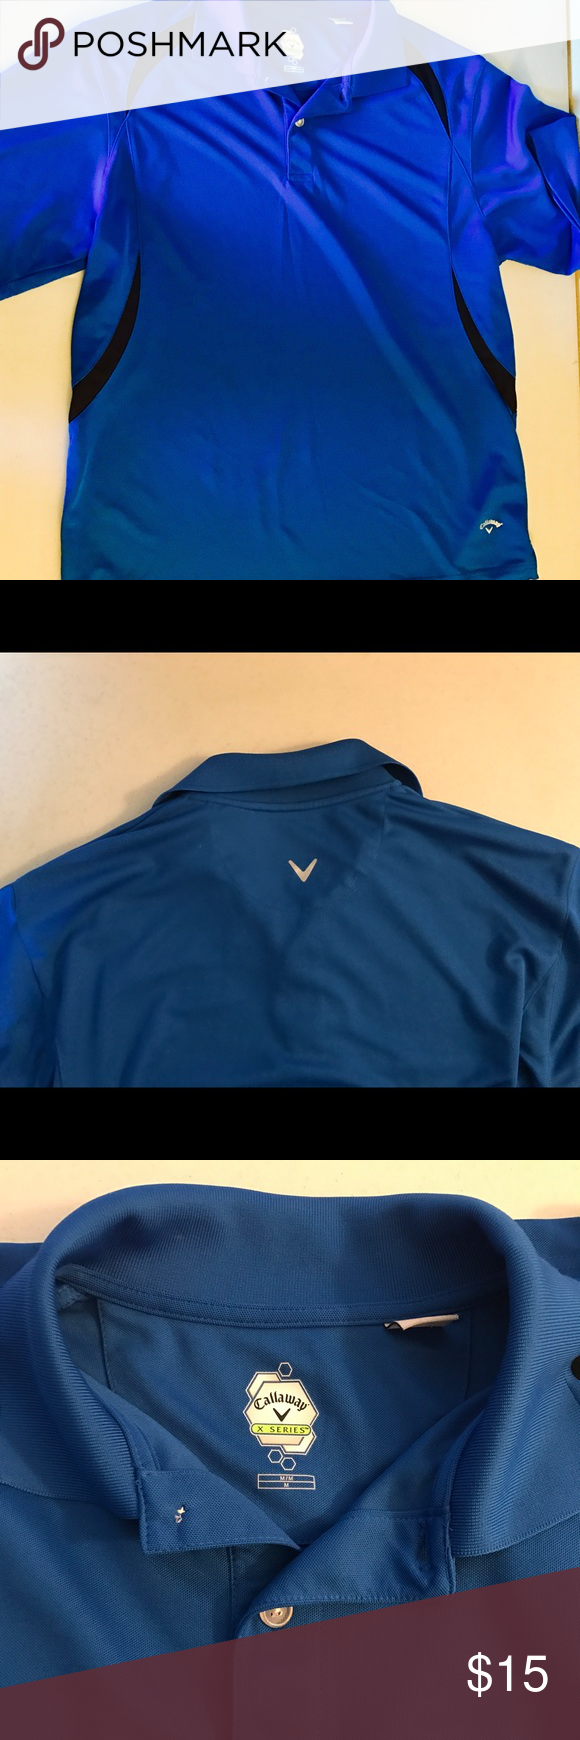 Callaway Men's M Golf Shirt EUC royal blue with some black detail, Callaway golf shirt. Men's Medium, runs a bit big. Get ready for the season! Callaway Shirts Polos